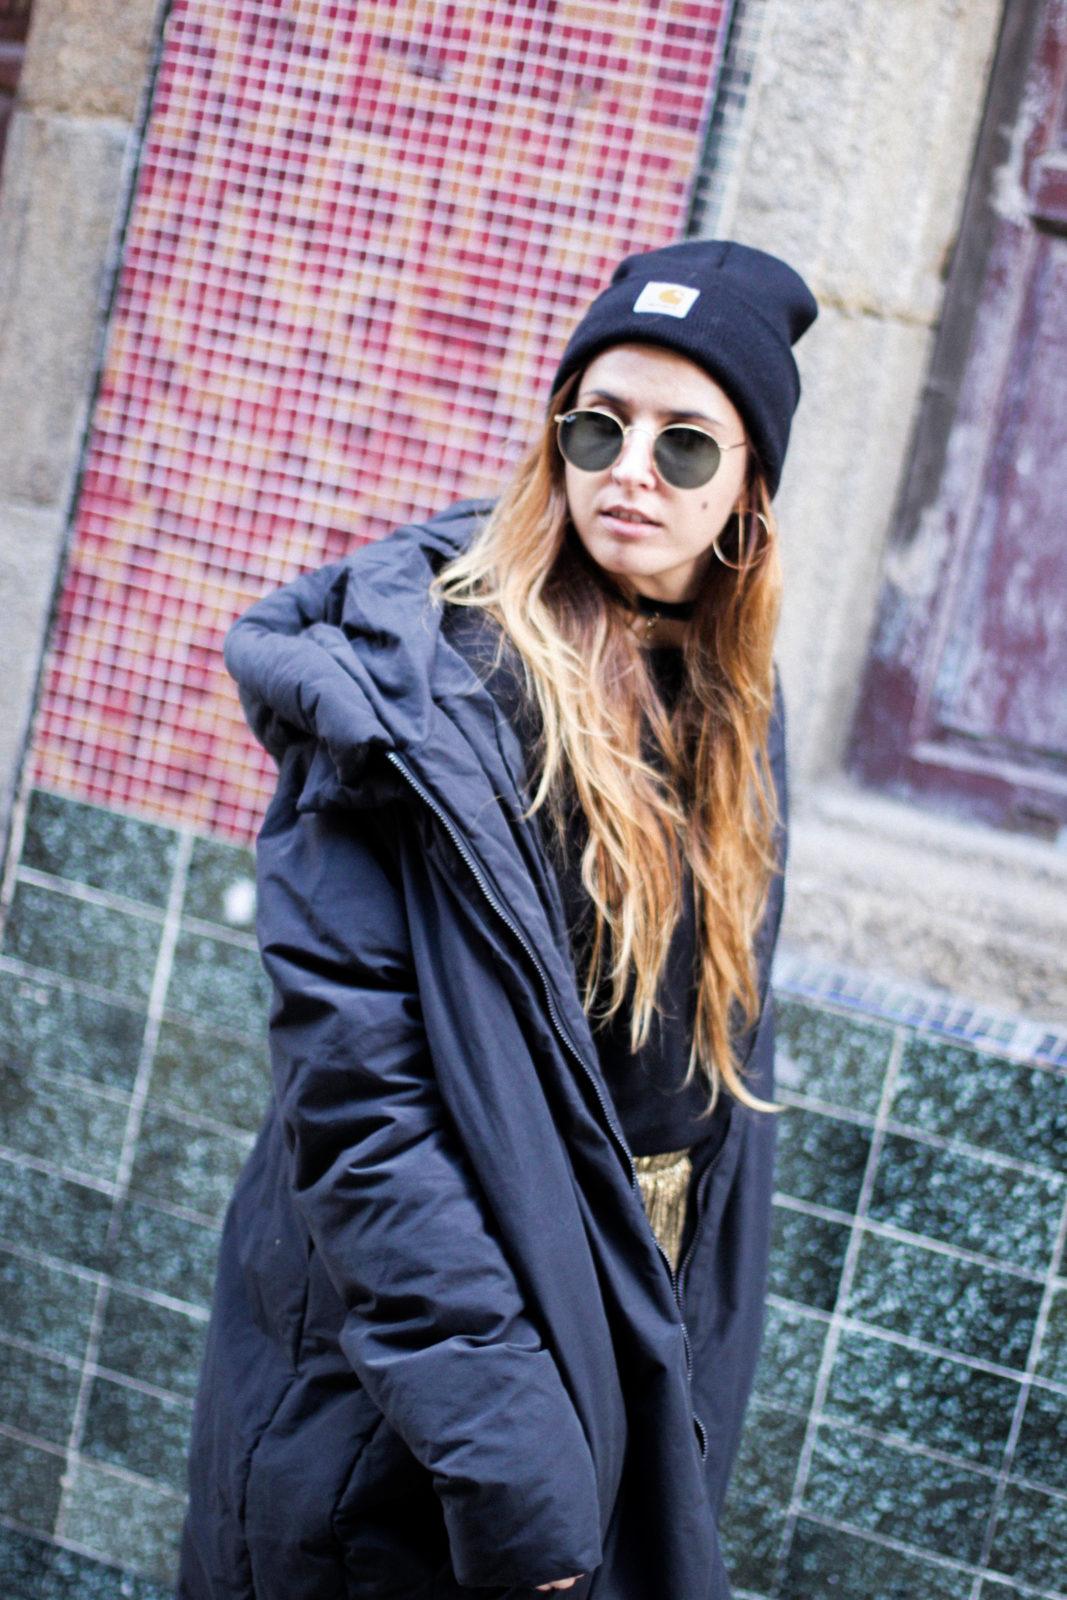 puffer_coat_plumifero_maxi_abrigo_calcetines_rejilla_falda_midi_metalizados_beanie_choker_vans-16